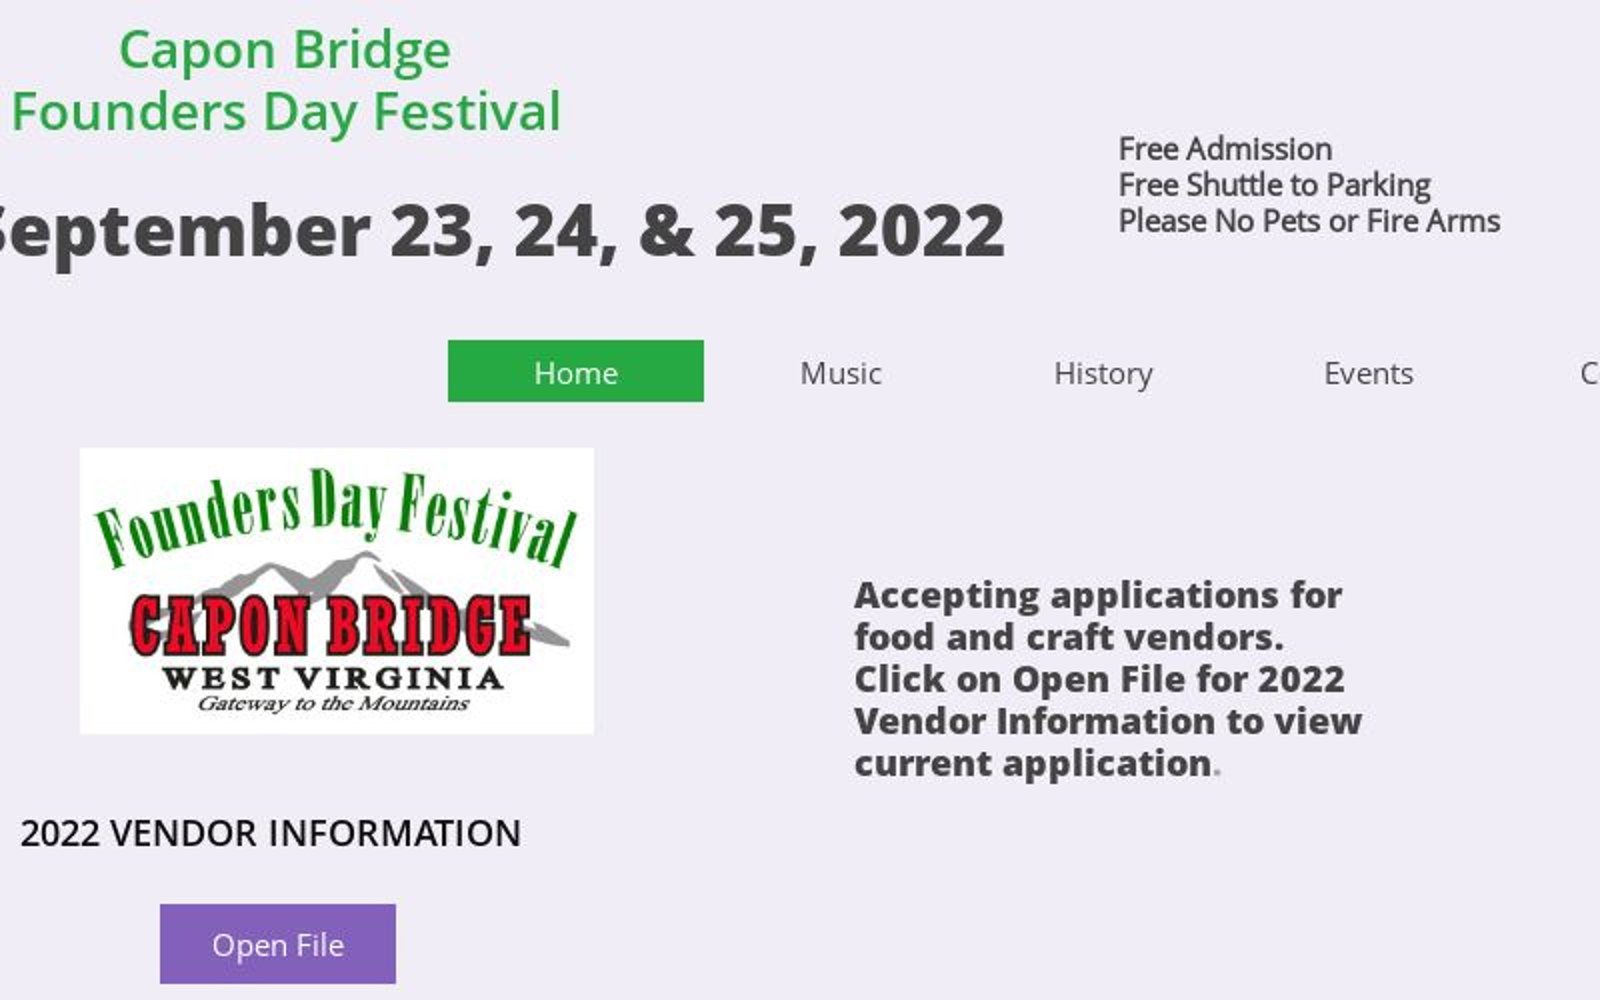 (c) Cbfoundersdayfestival.net